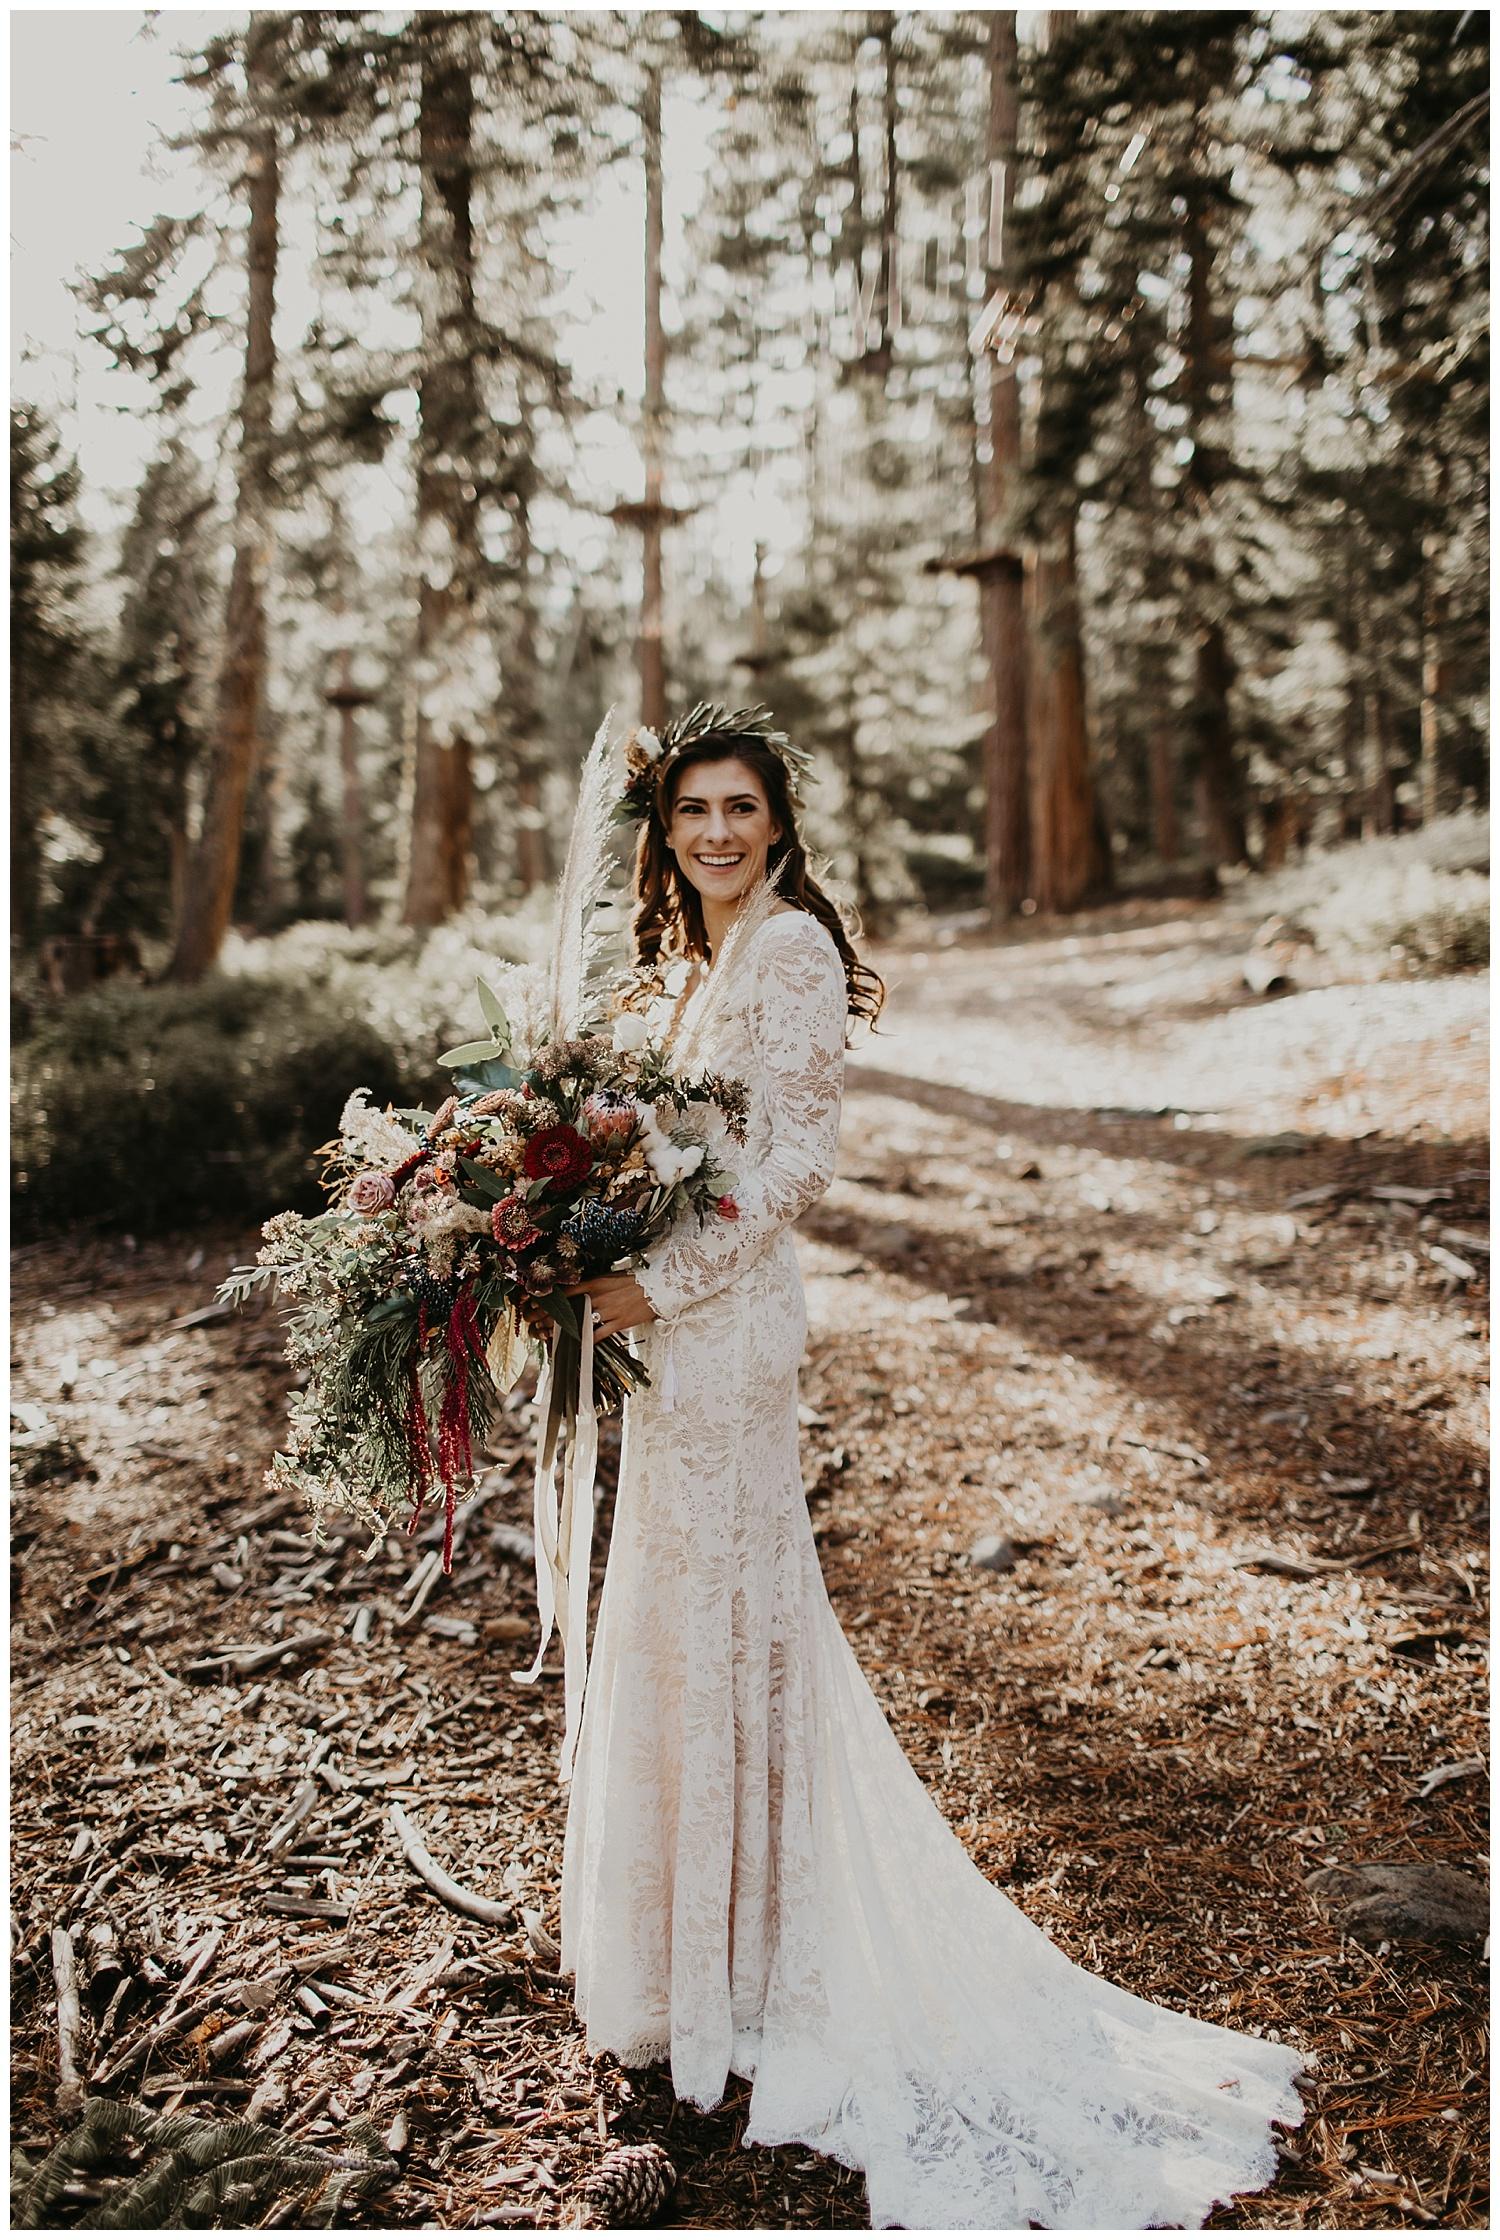 lake-tahoe-winter-wedding-boho-lace-wedding-dress.jpg